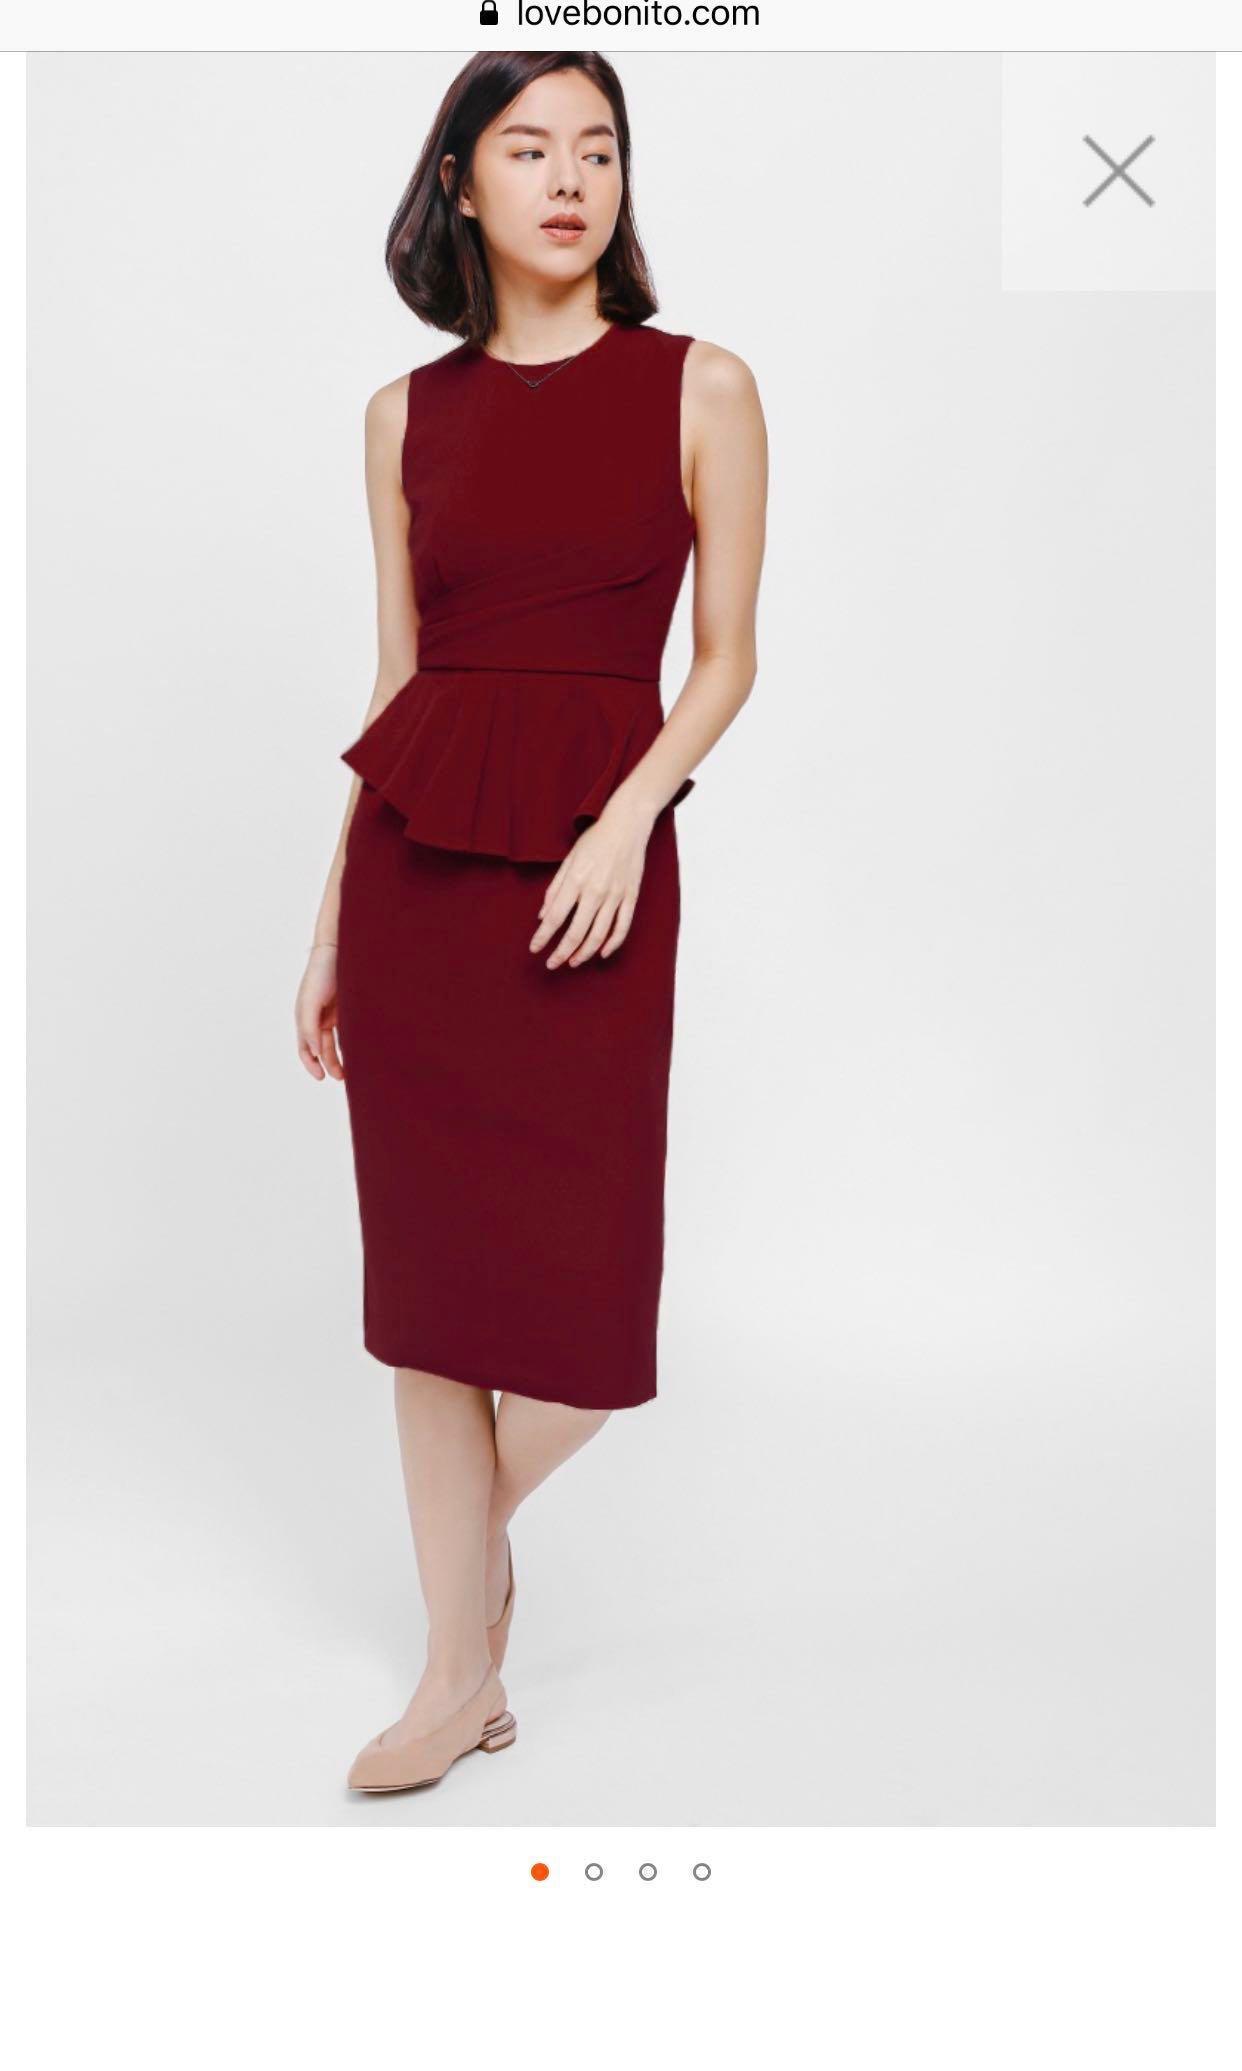 3aa41b8c705a Love bonito Yione peplum midi dress, Women's Fashion, Clothes ...